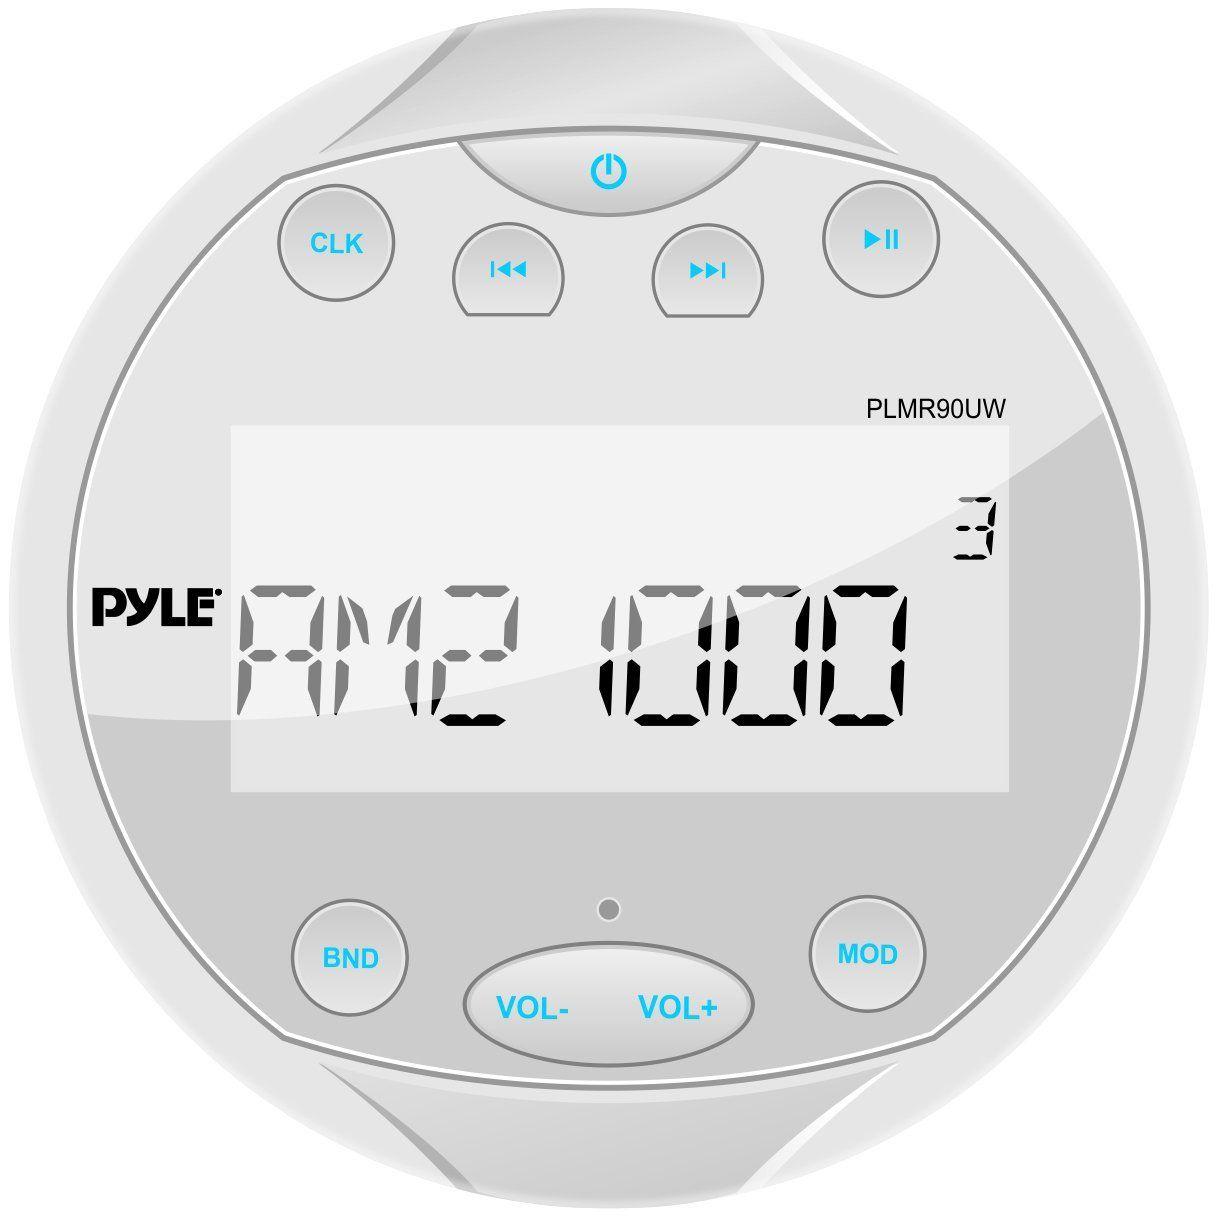 Pyle Plmr90uw Hydra Waterproof Bluetooth Marine Digital Receiver Stereo Radio Usb Mp3 Am Fm Aux Input Click Image For More Usb Radio Marine Stereo Usb Mp3